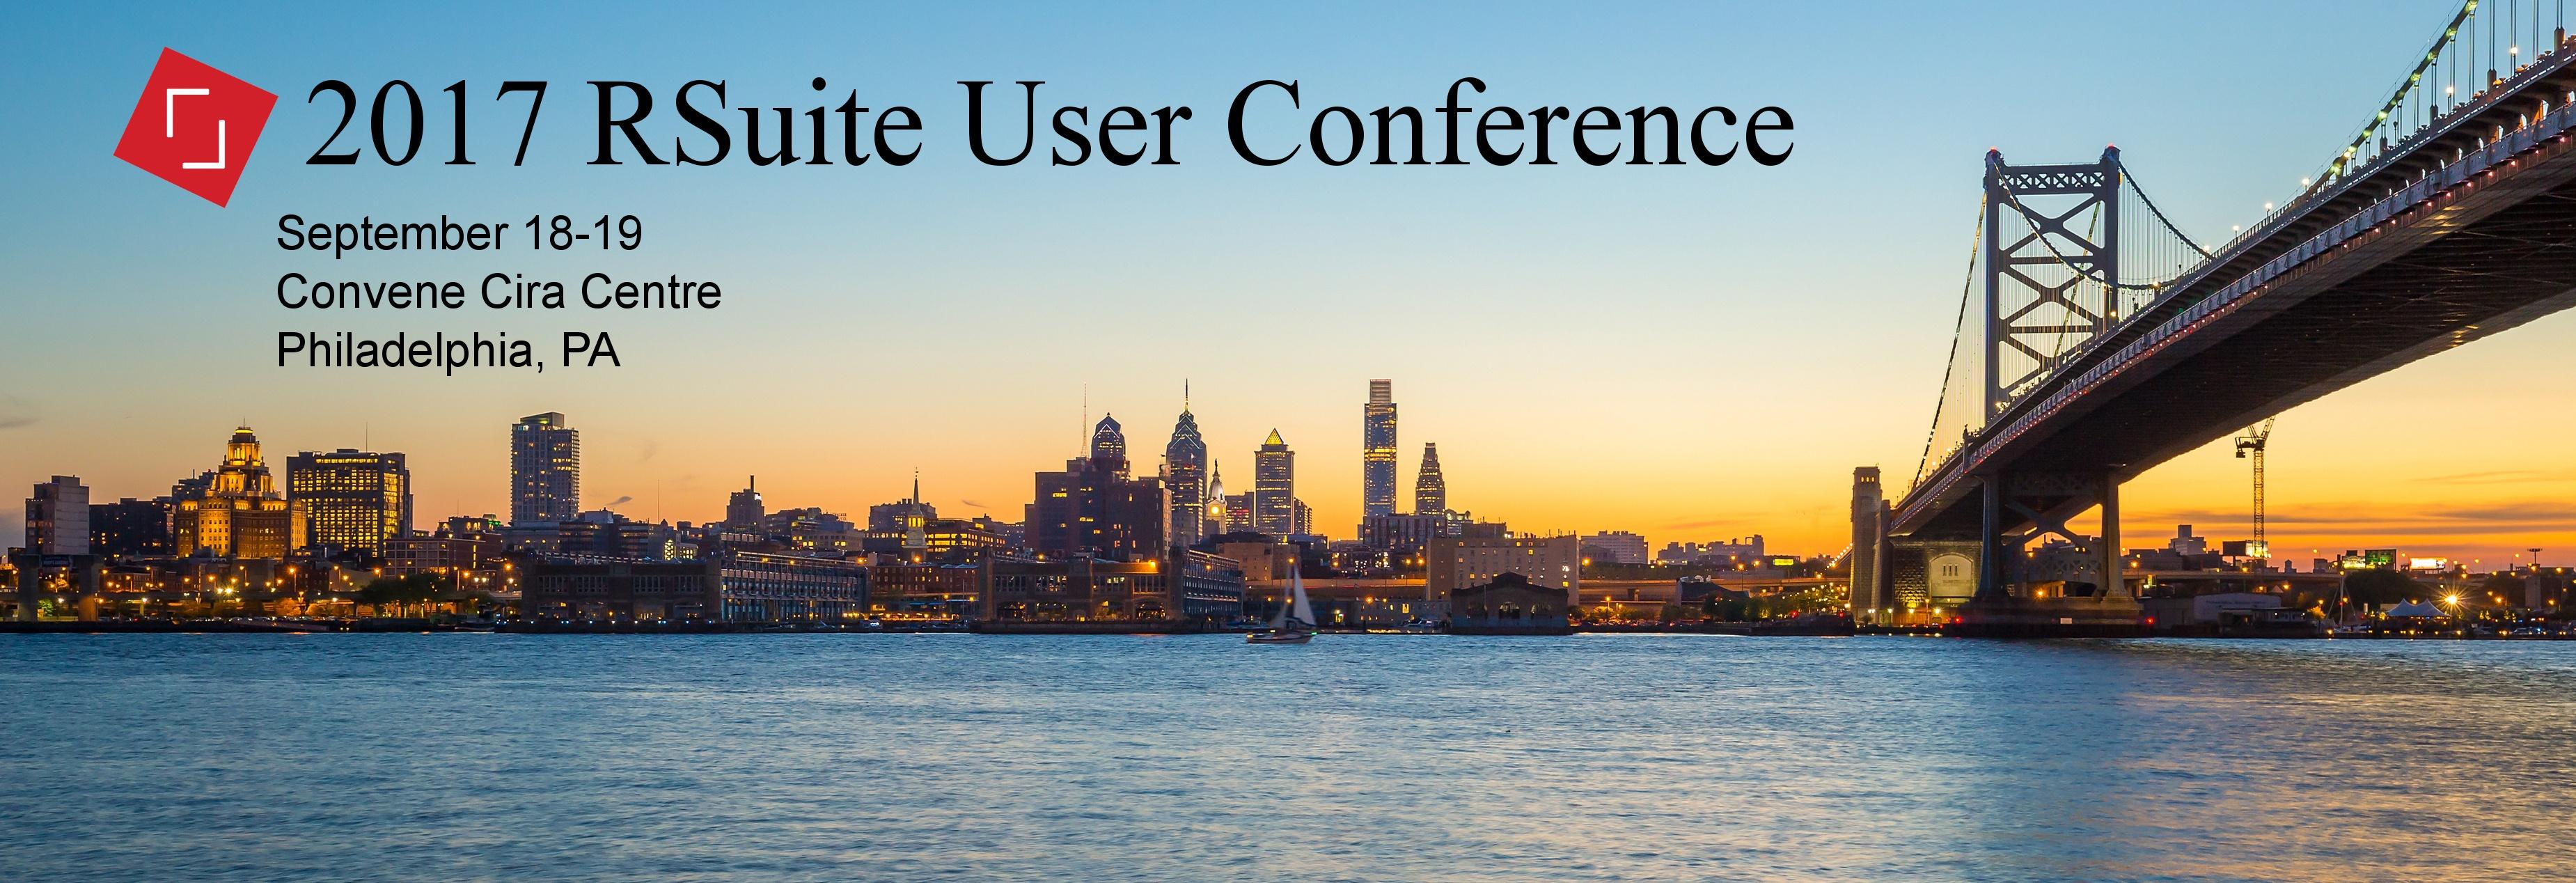 RSuite UC 2017 banner2.jpg